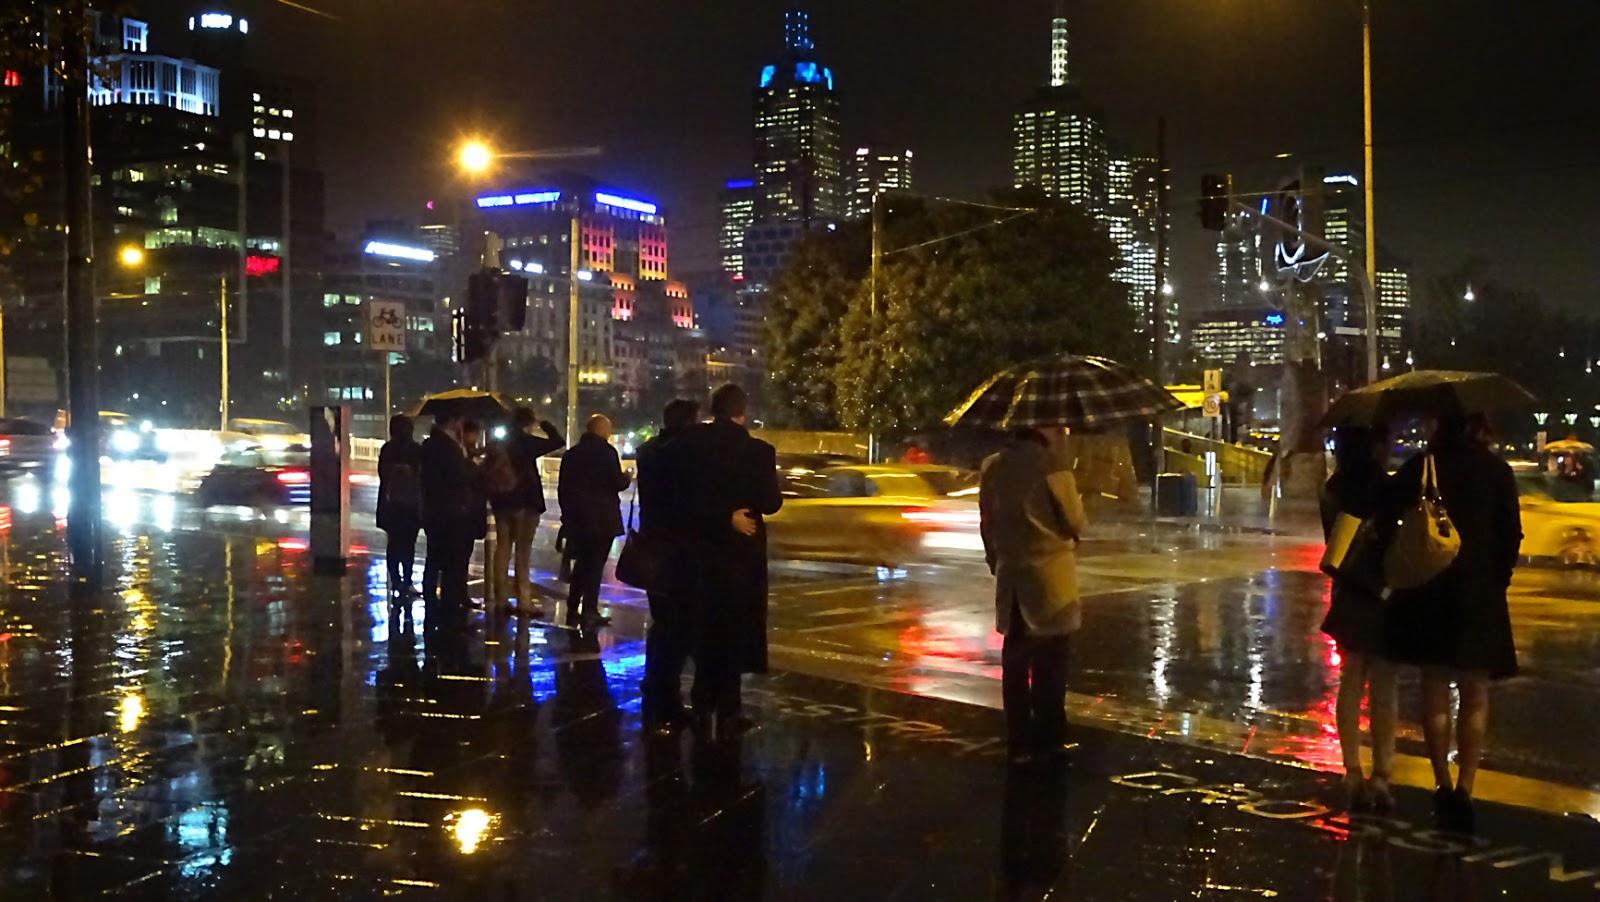 MAP: RAINY NIGHT IN THE CITY